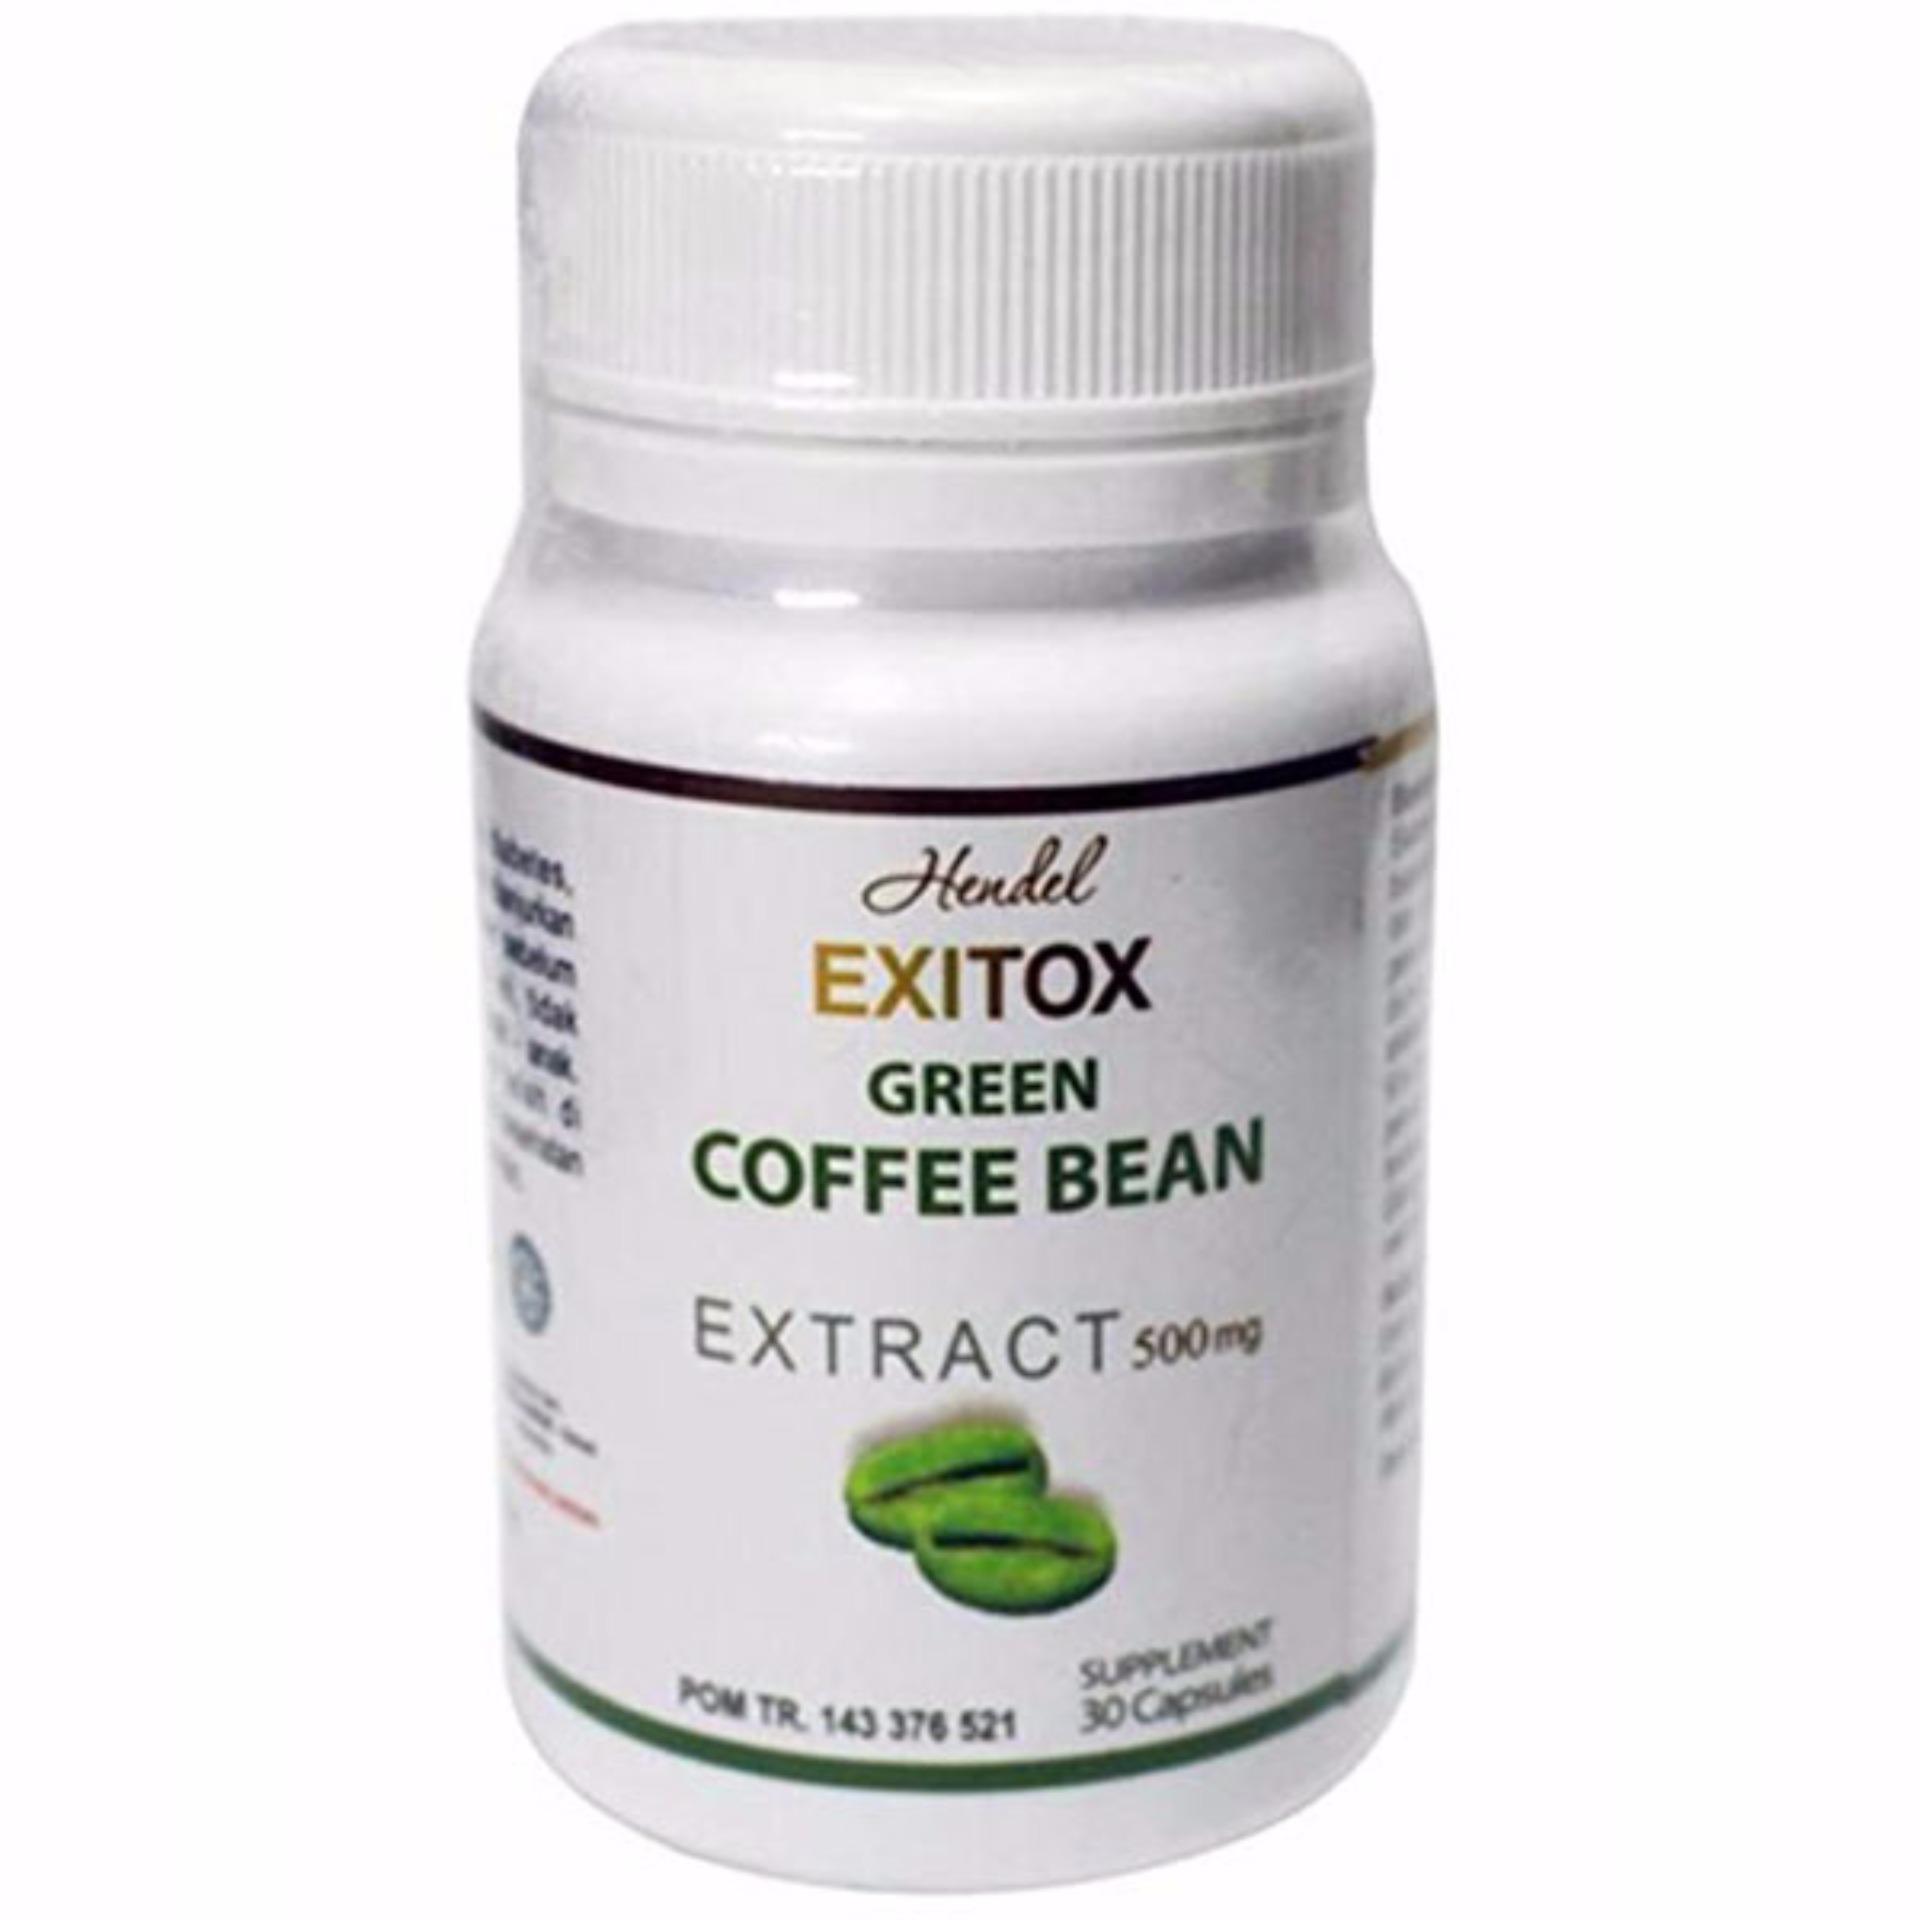 ... Green Coffee Bean Hendel Exitox Extract 500Mg 30 Kapsul Original Asli Pelangsing Alami Ampuh Aman Bahan ...